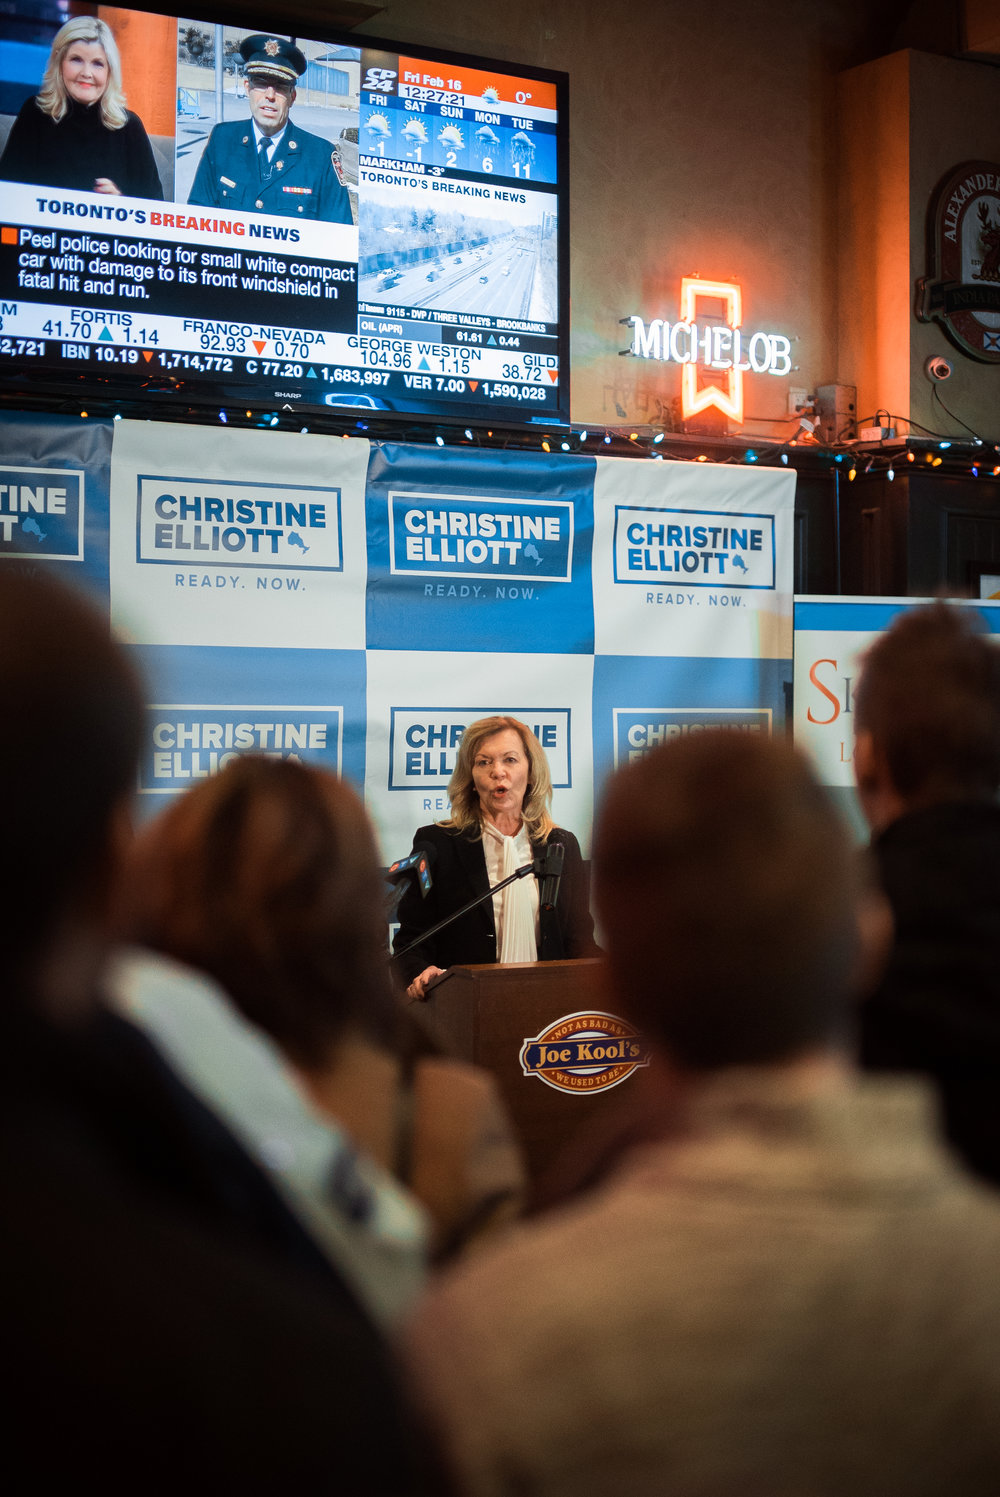 Christine Elliot - politician